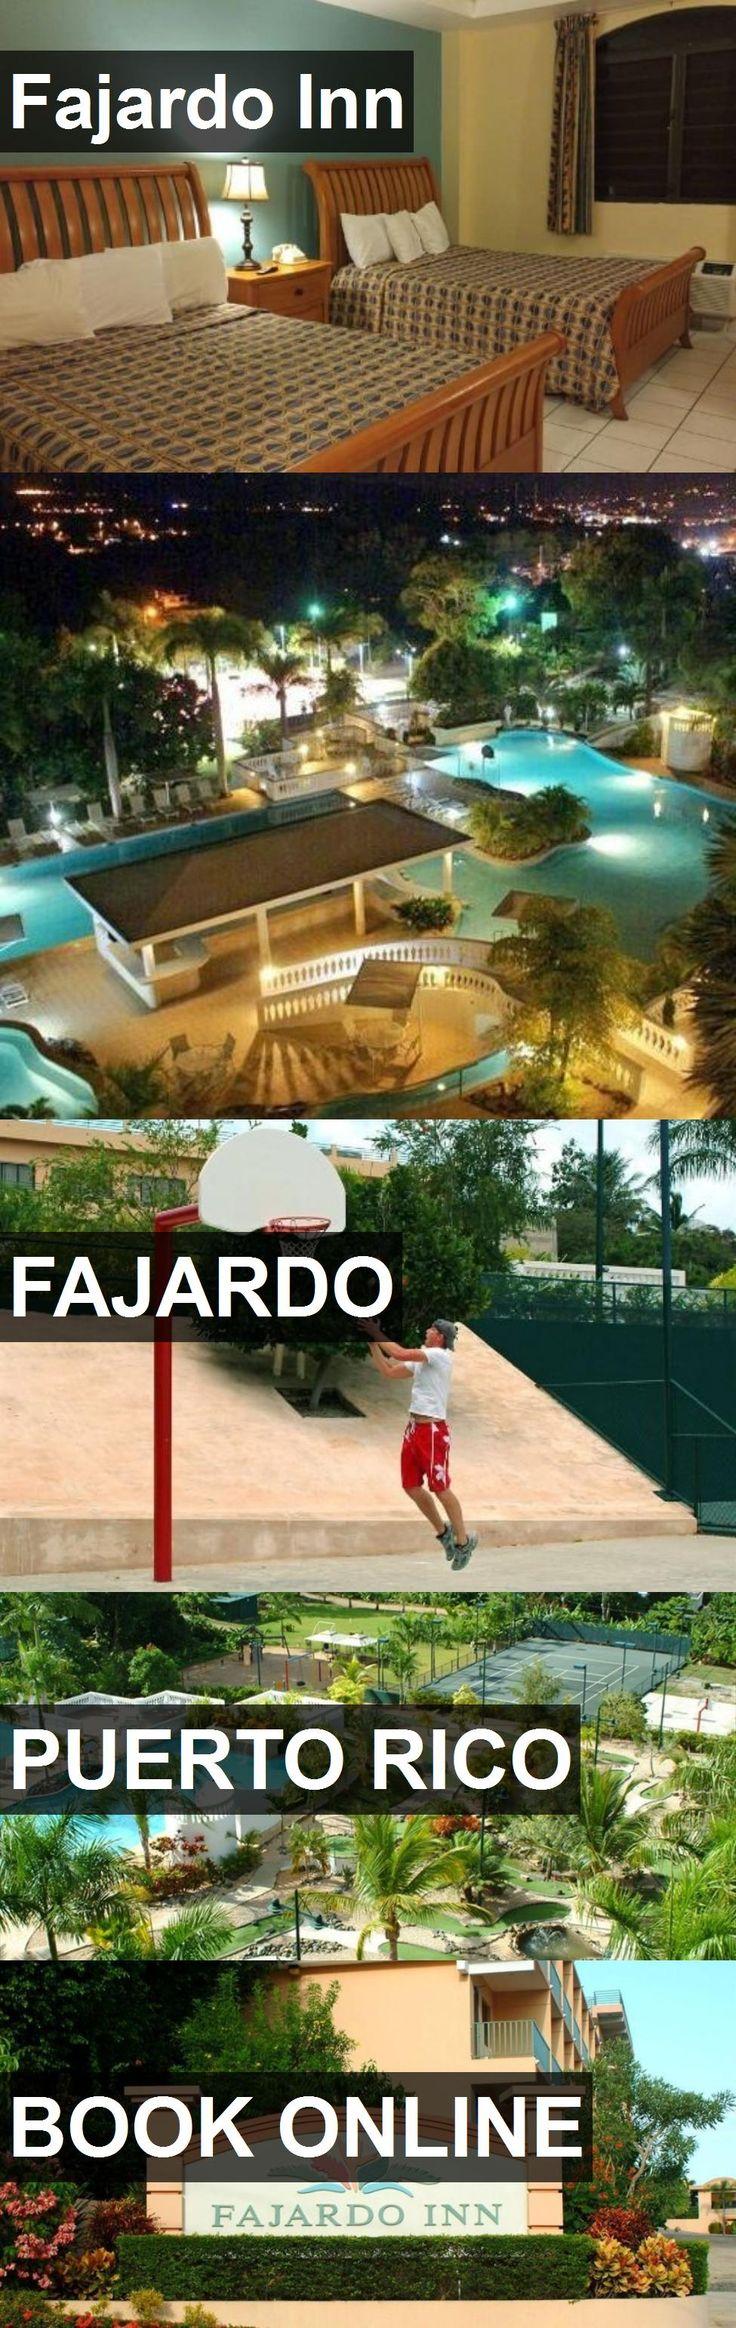 Hotel Fajardo Inn in Fajardo, Puerto Rico. For more information, photos, reviews and best prices please follow the link. #PuertoRico #Fajardo #travel #vacation #hotel